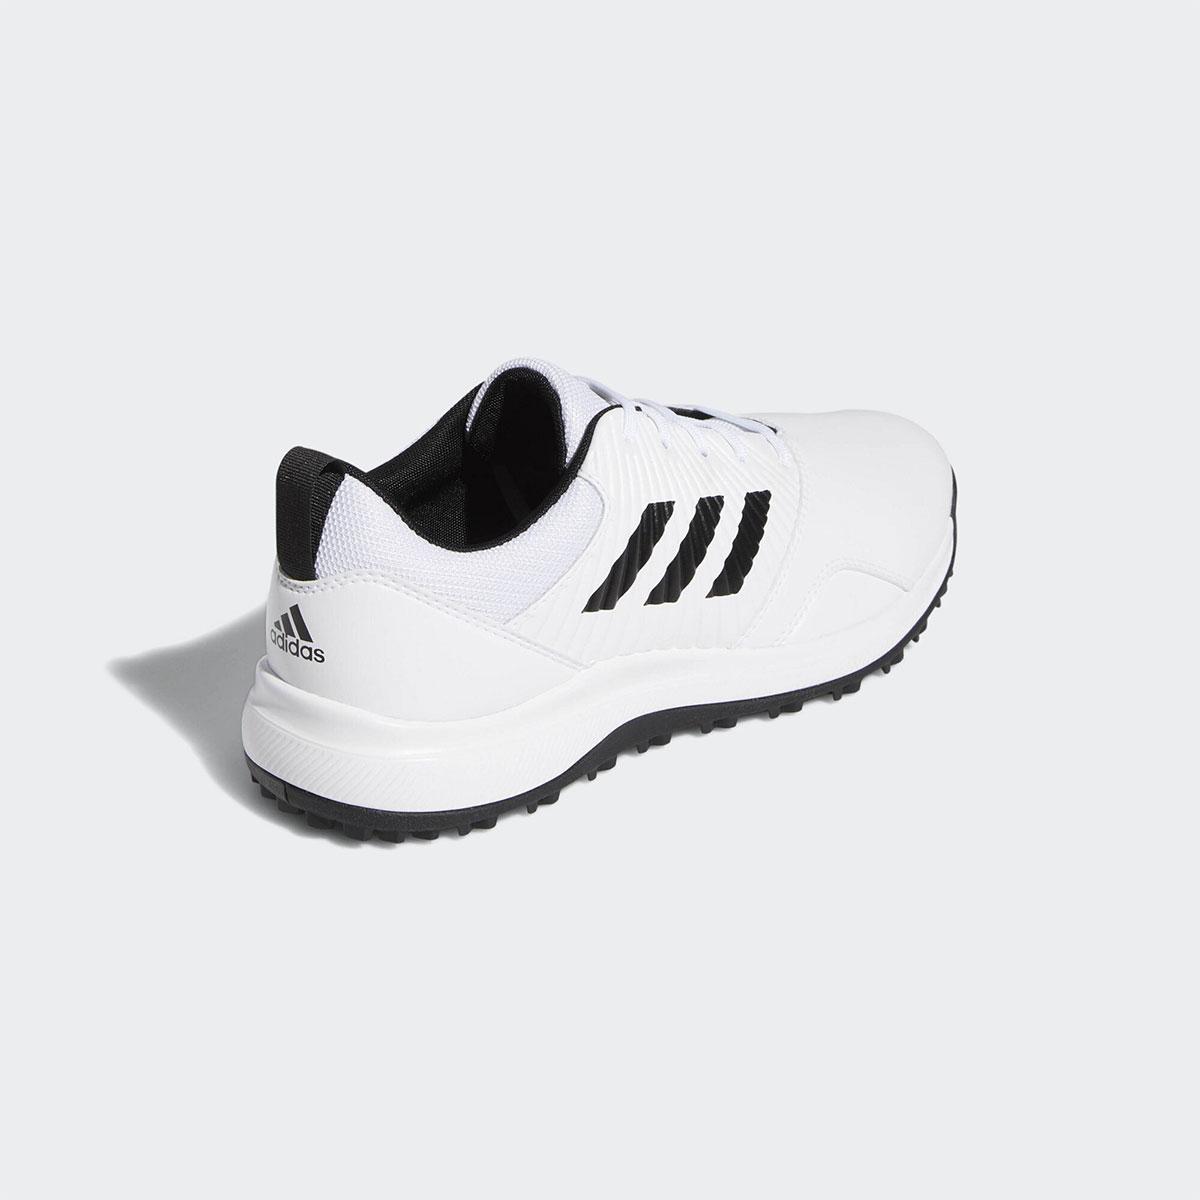 best service 75ef4 c6a77 adidas Golf CP Traxion SL Shoes